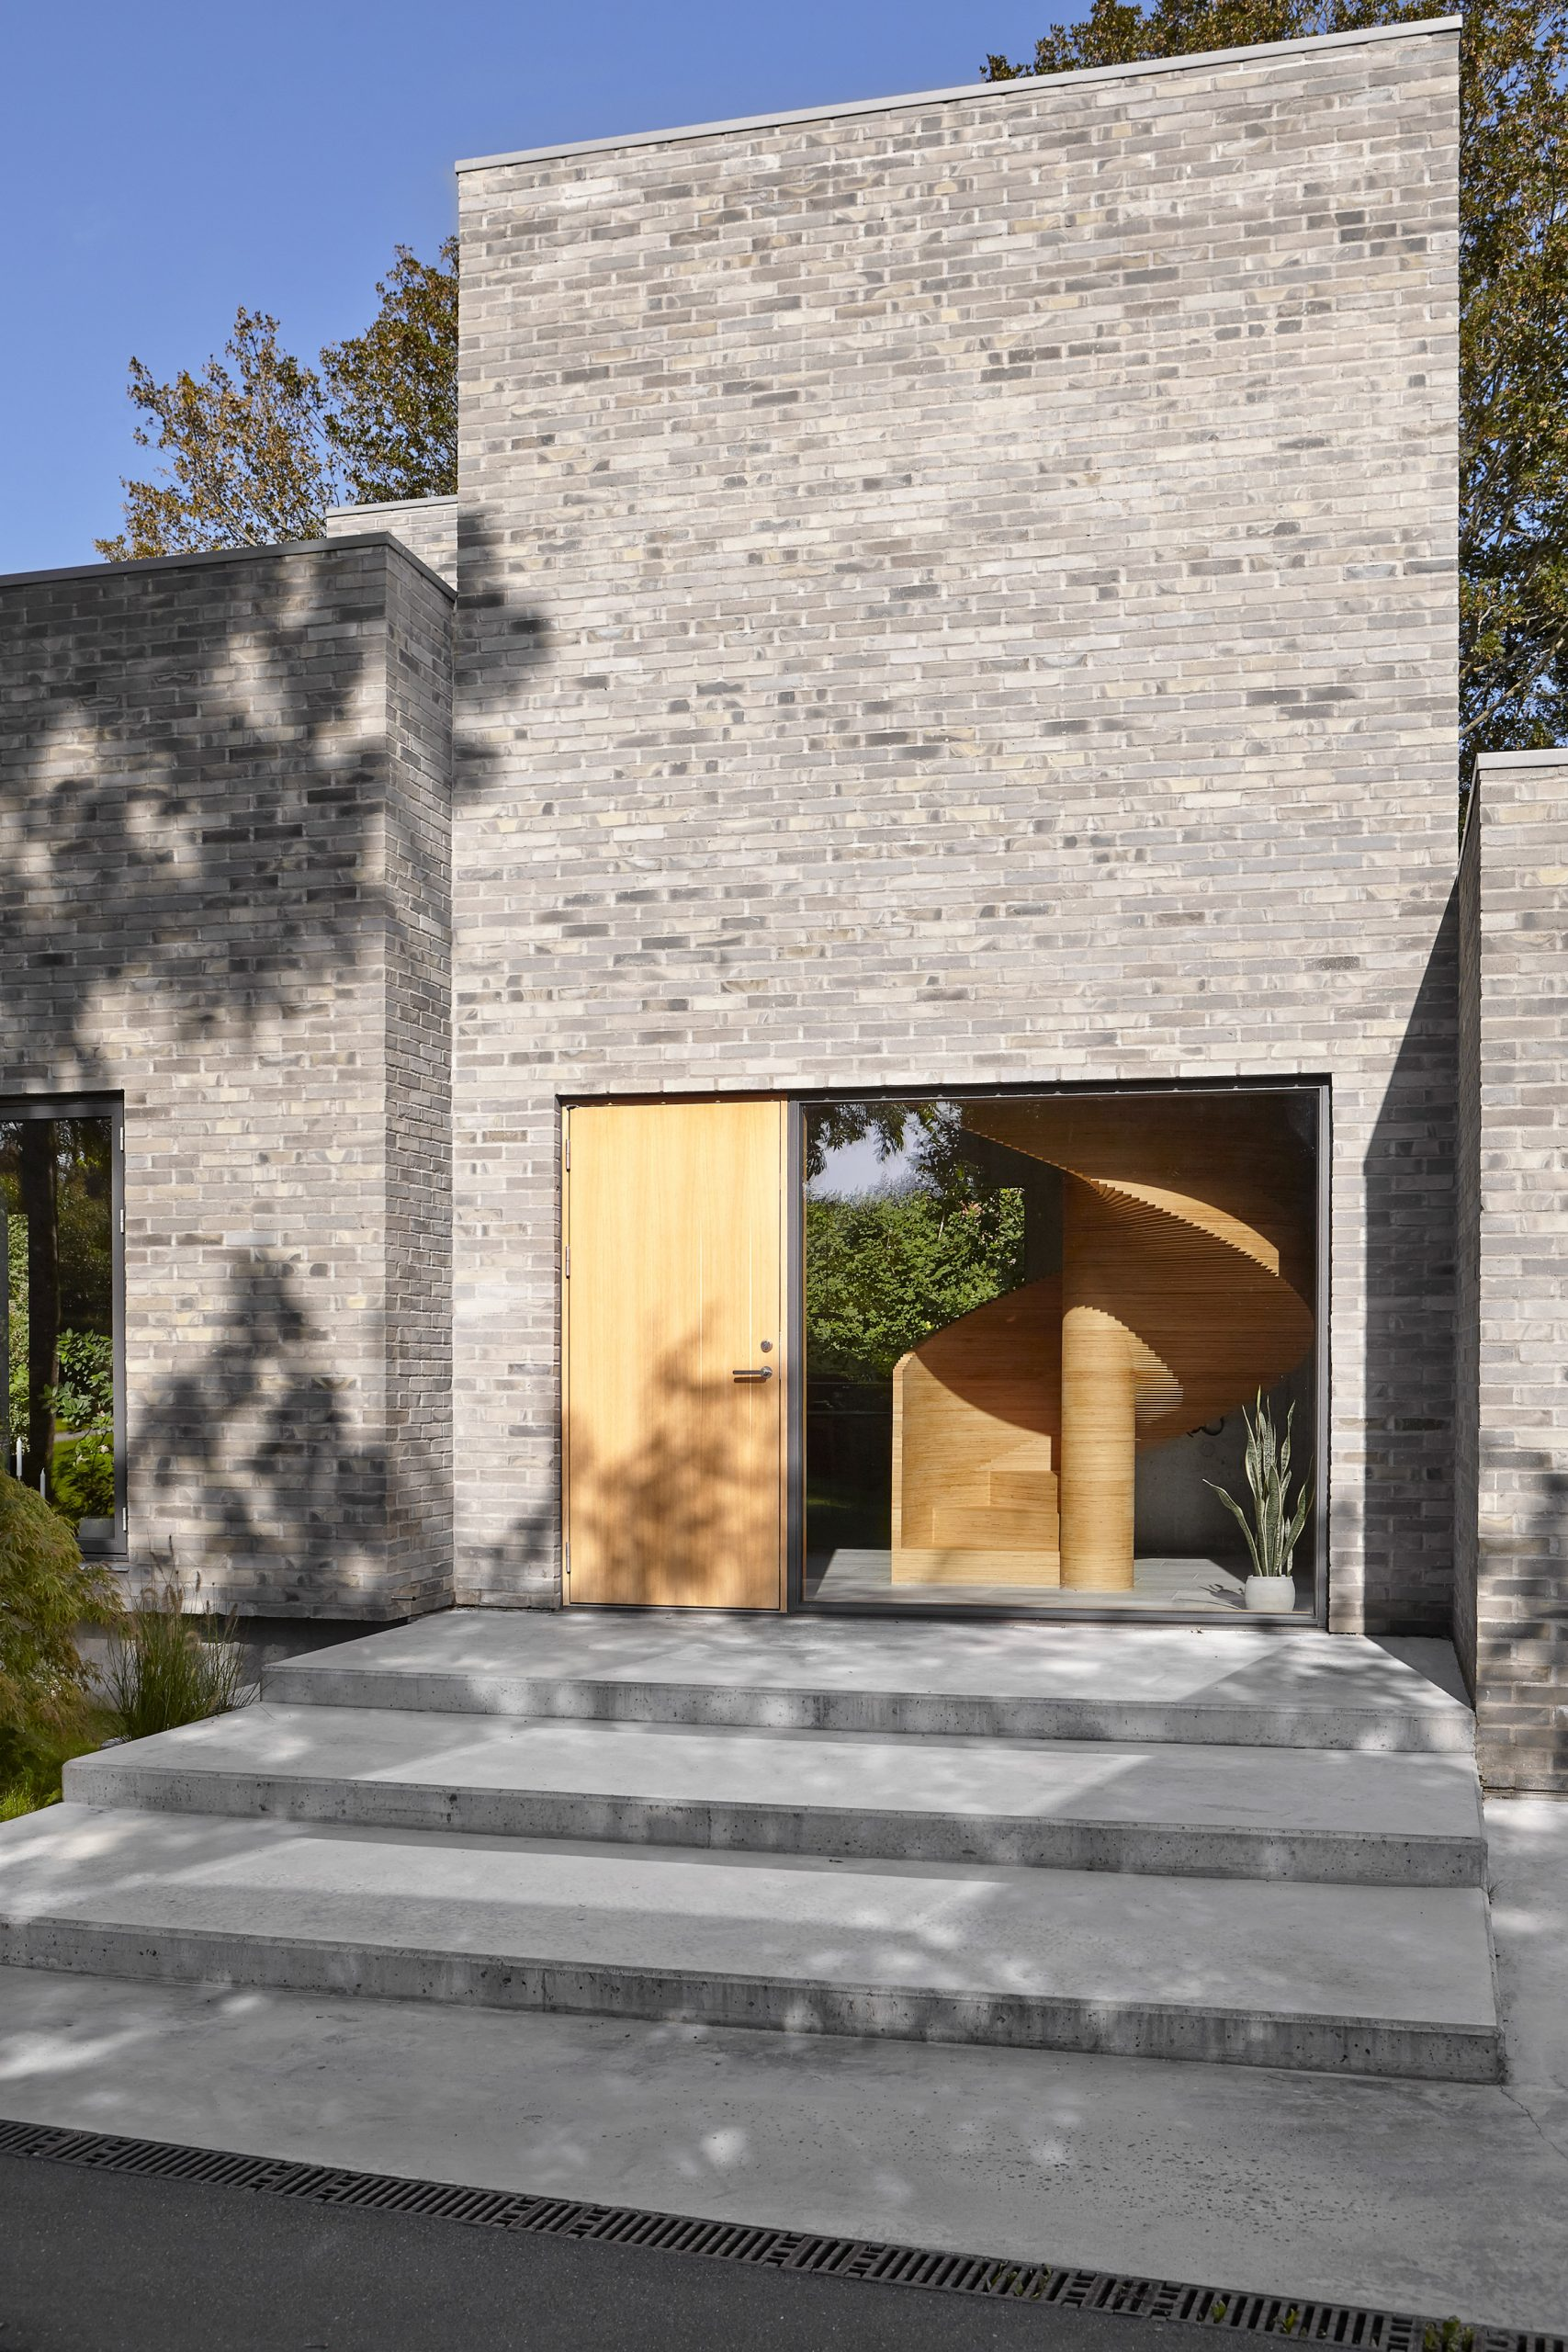 tommy-rand-house-denmark_dezeen_2364_col_0-scaled.jpg